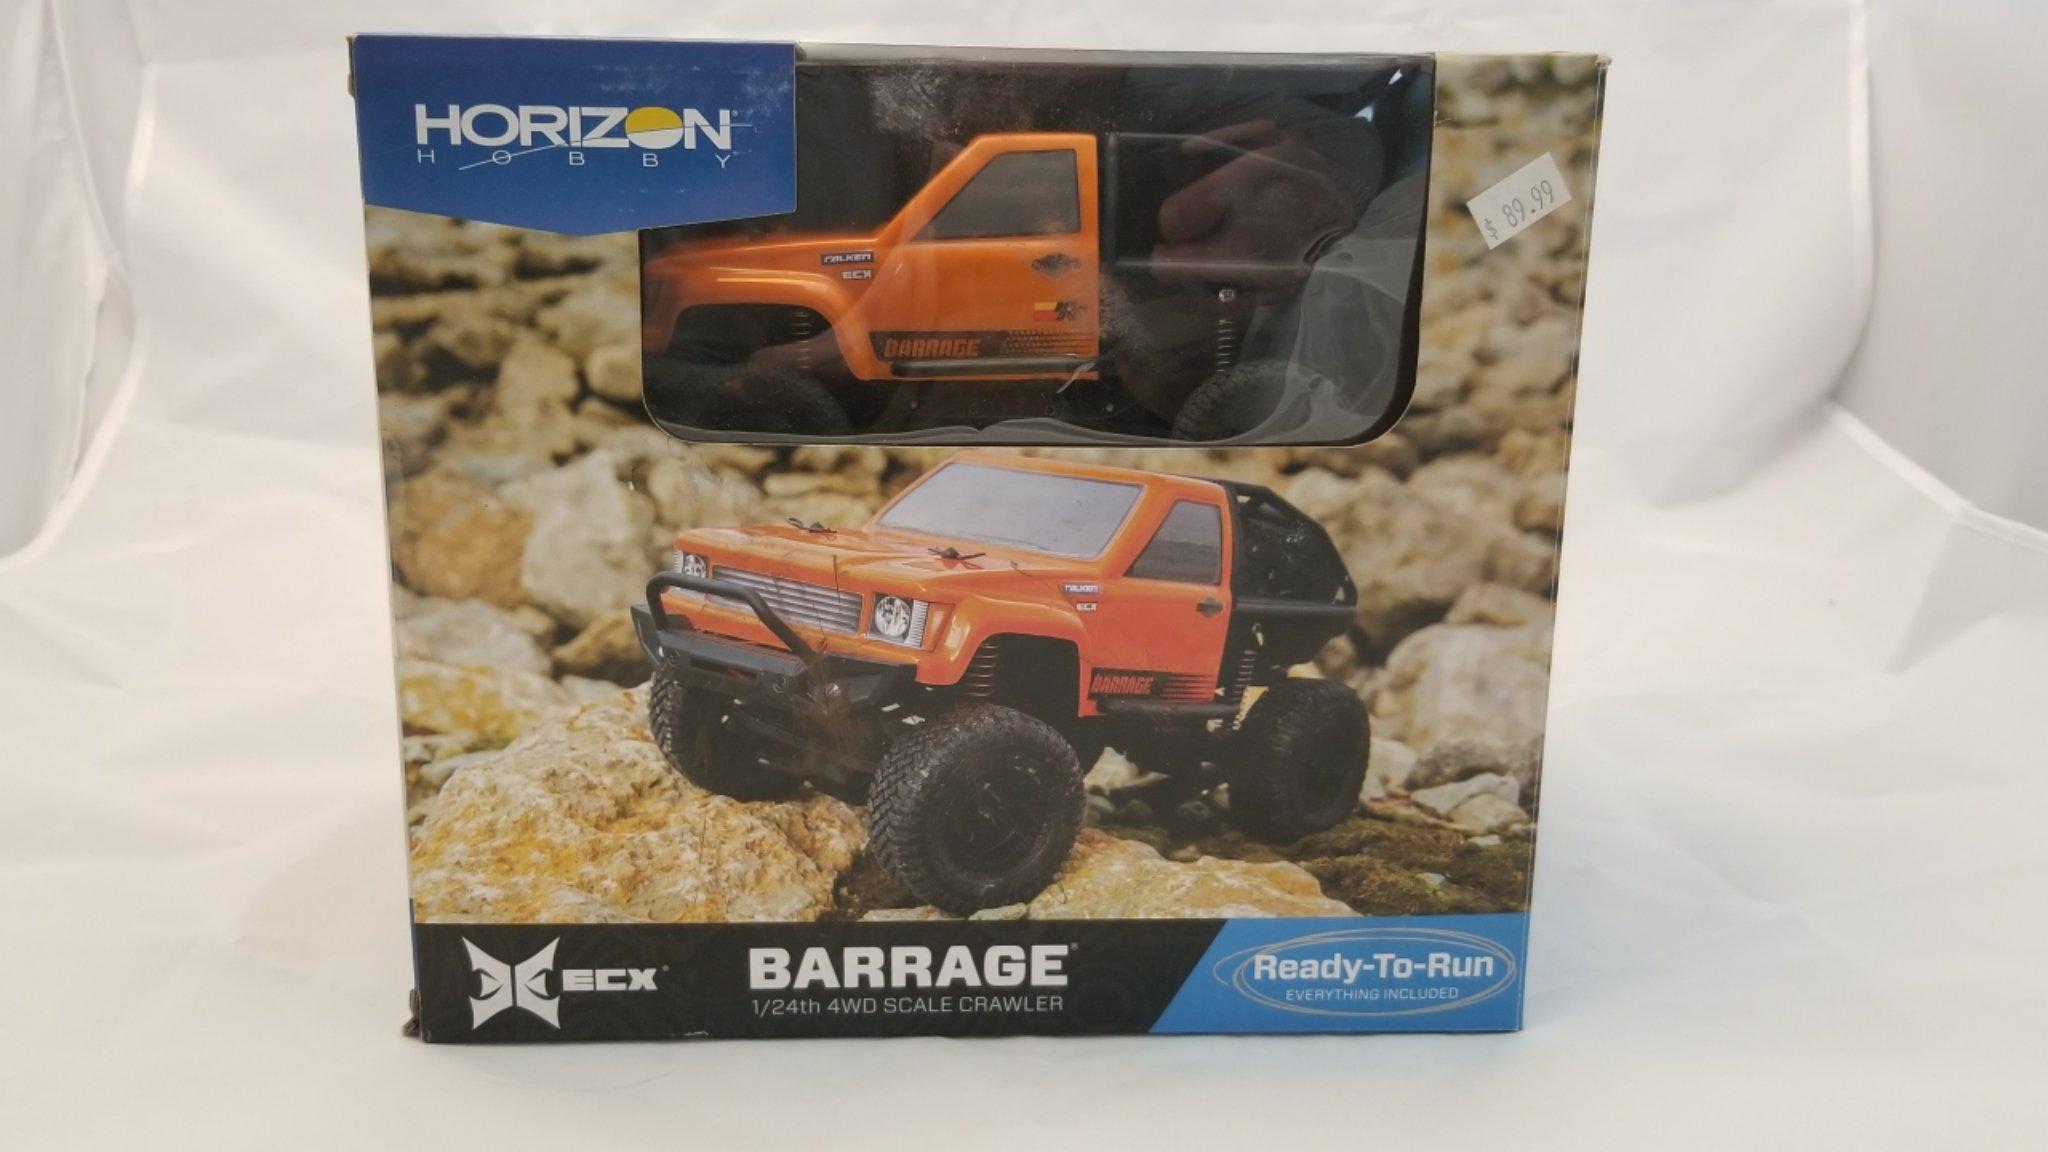 ECX Barrage 1/24 RTR Micro Rock Crawler w/2.4GHz Radio, Battery & Charger (open box) ECX00017T2